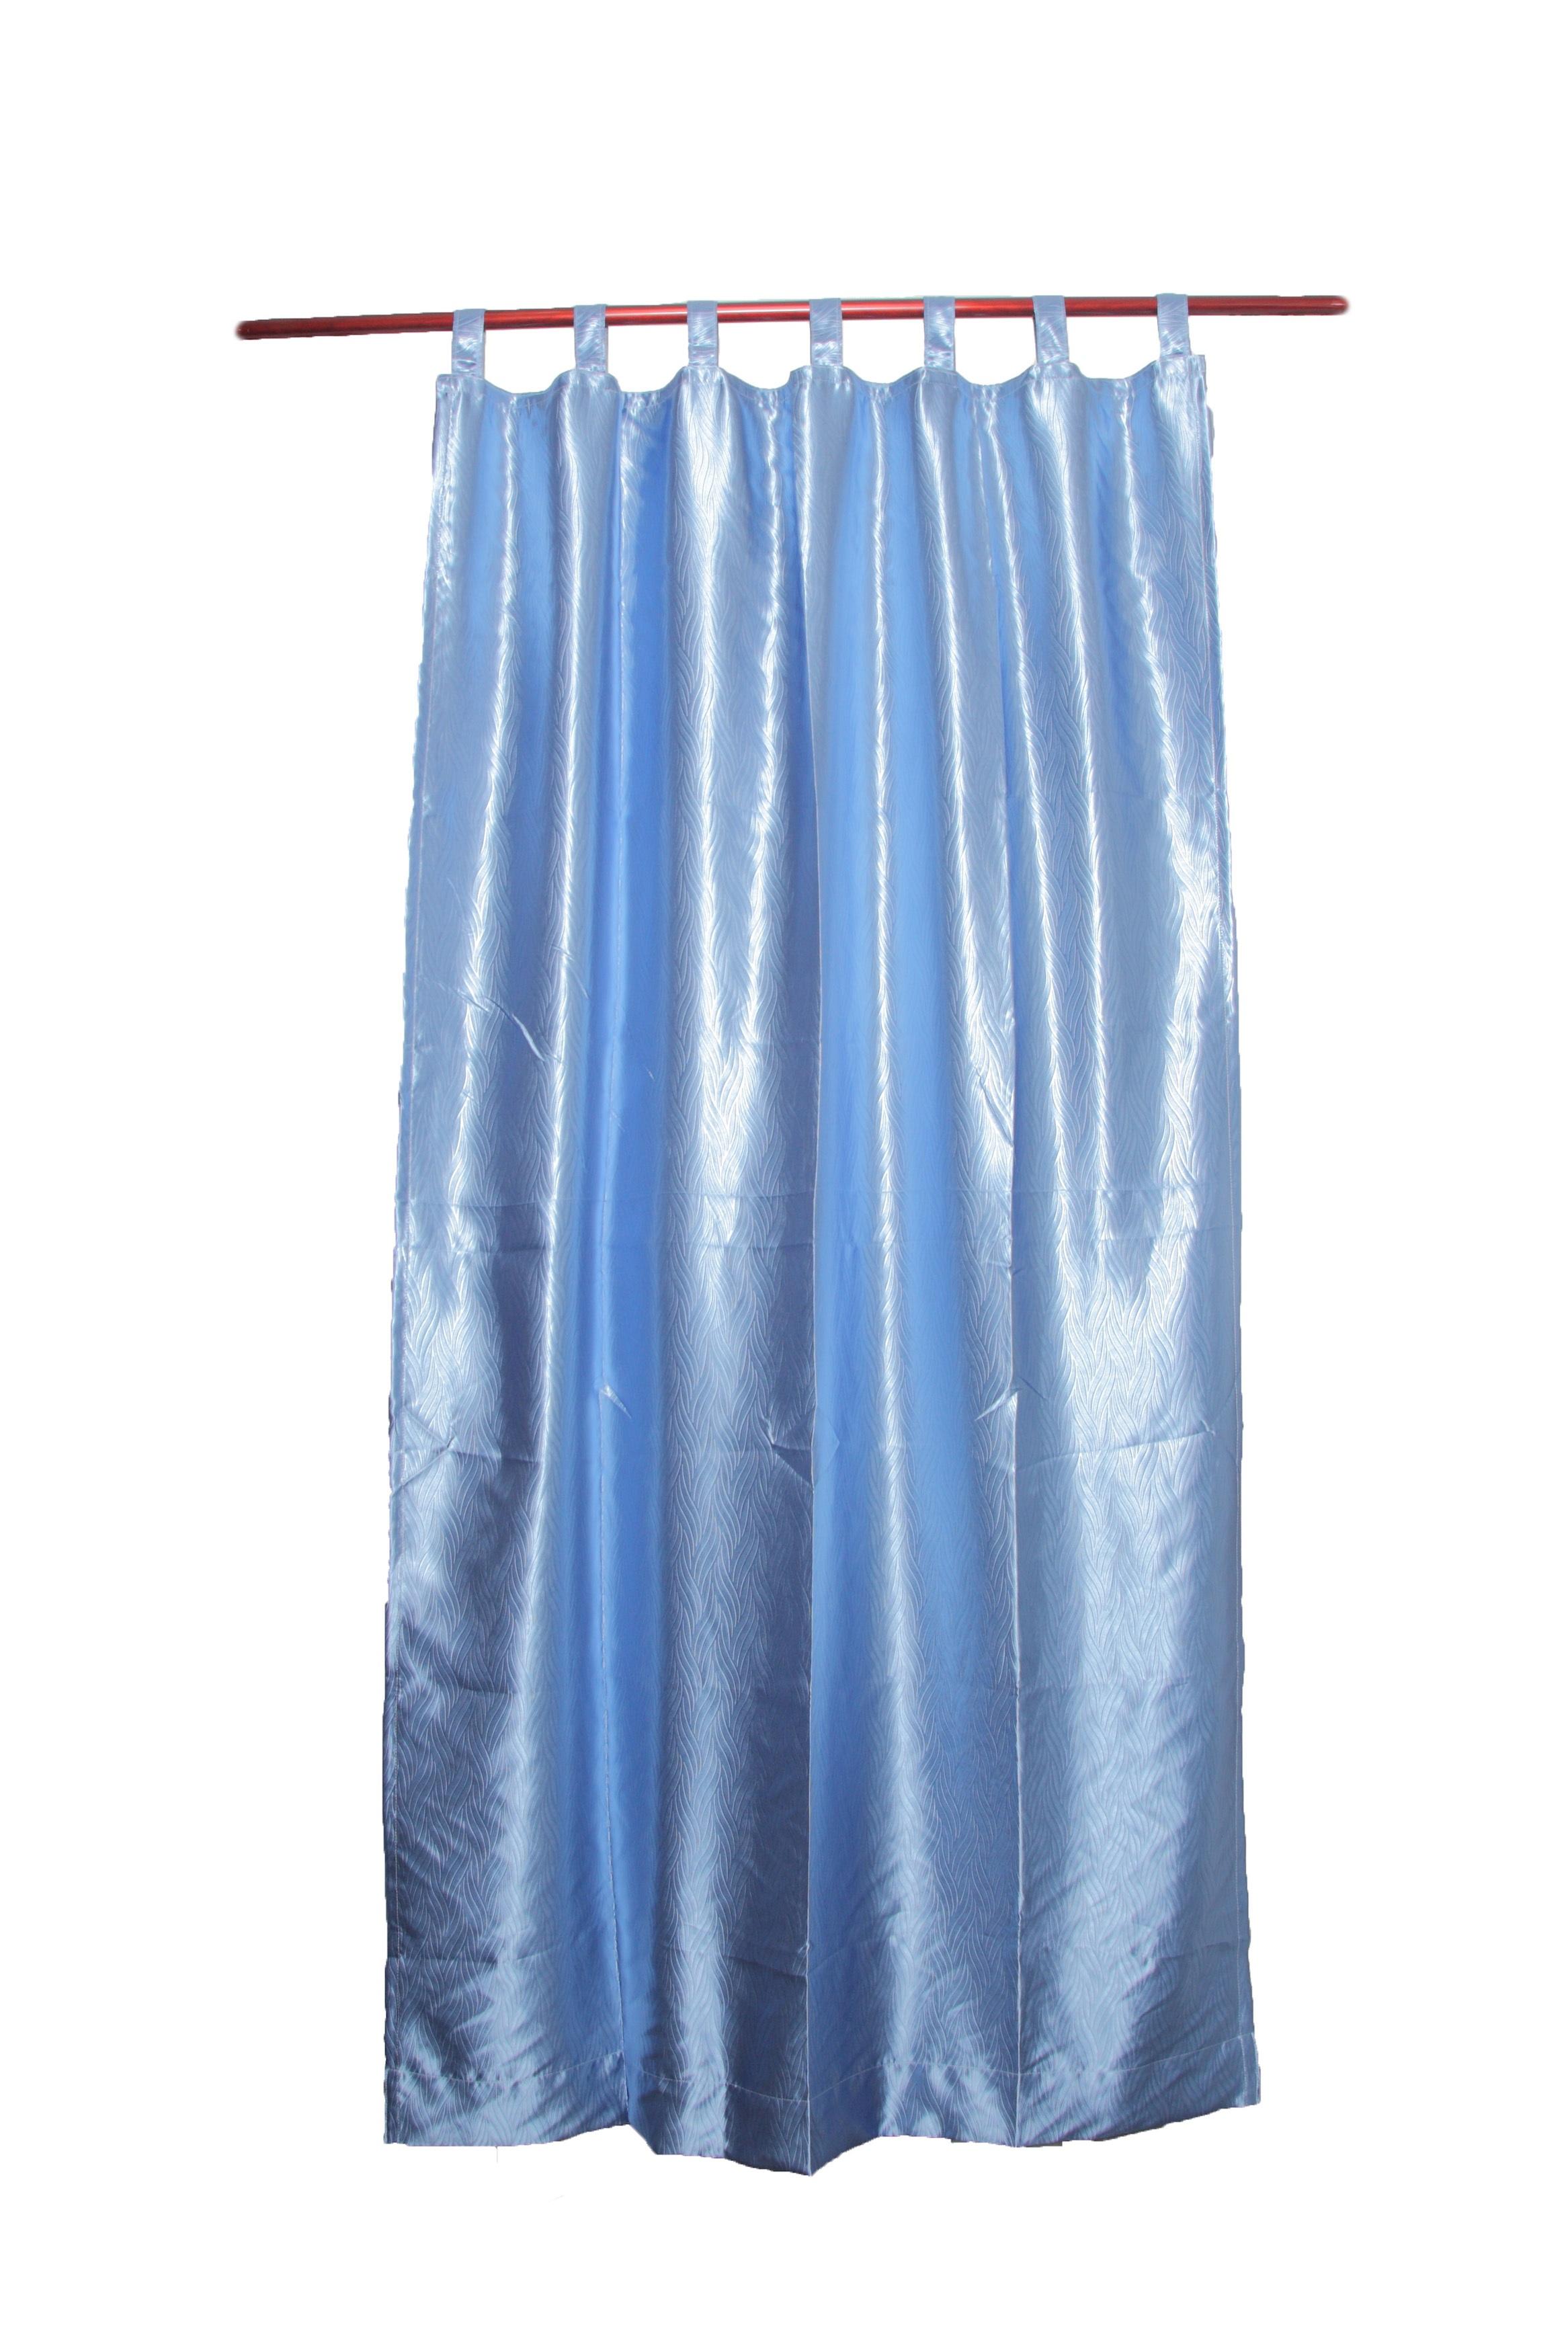 cortina azul ropa ropa de calle material diseo de interiores producto textil vestido angie cortinas cortinas